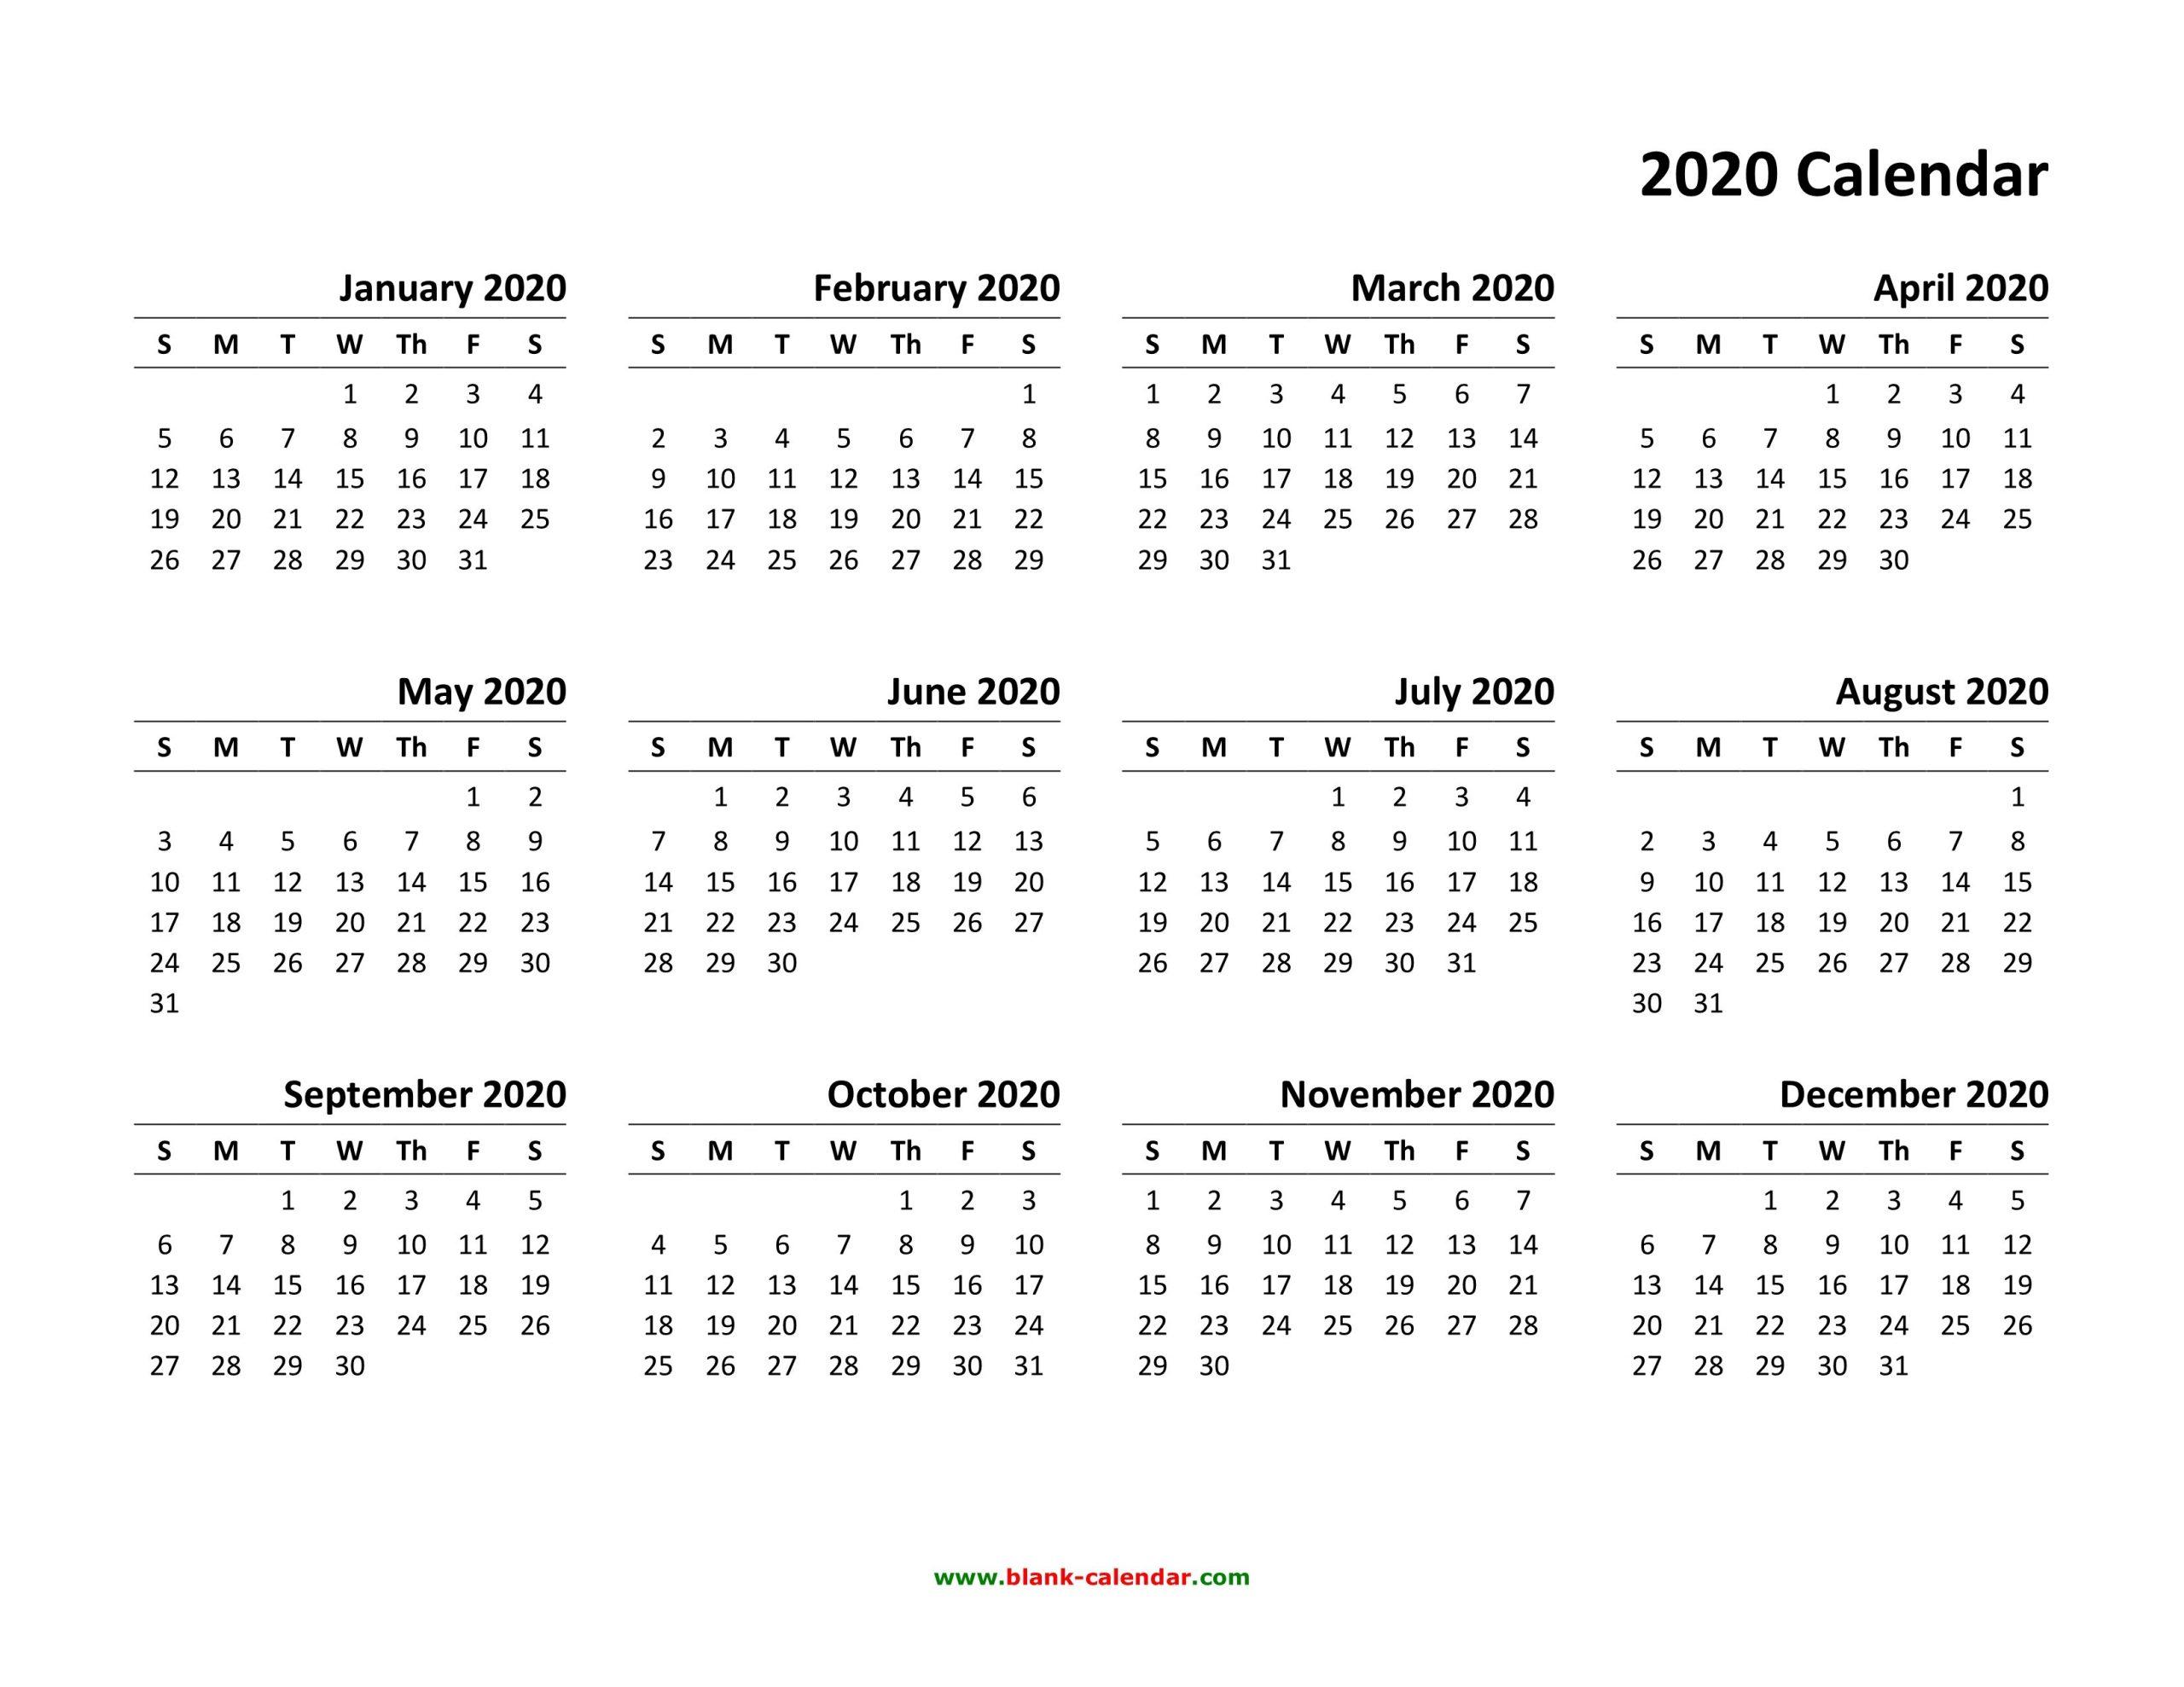 Free Printable 2020 Calendar To I Can Edit | Calendar Free Calendar I Can Edit